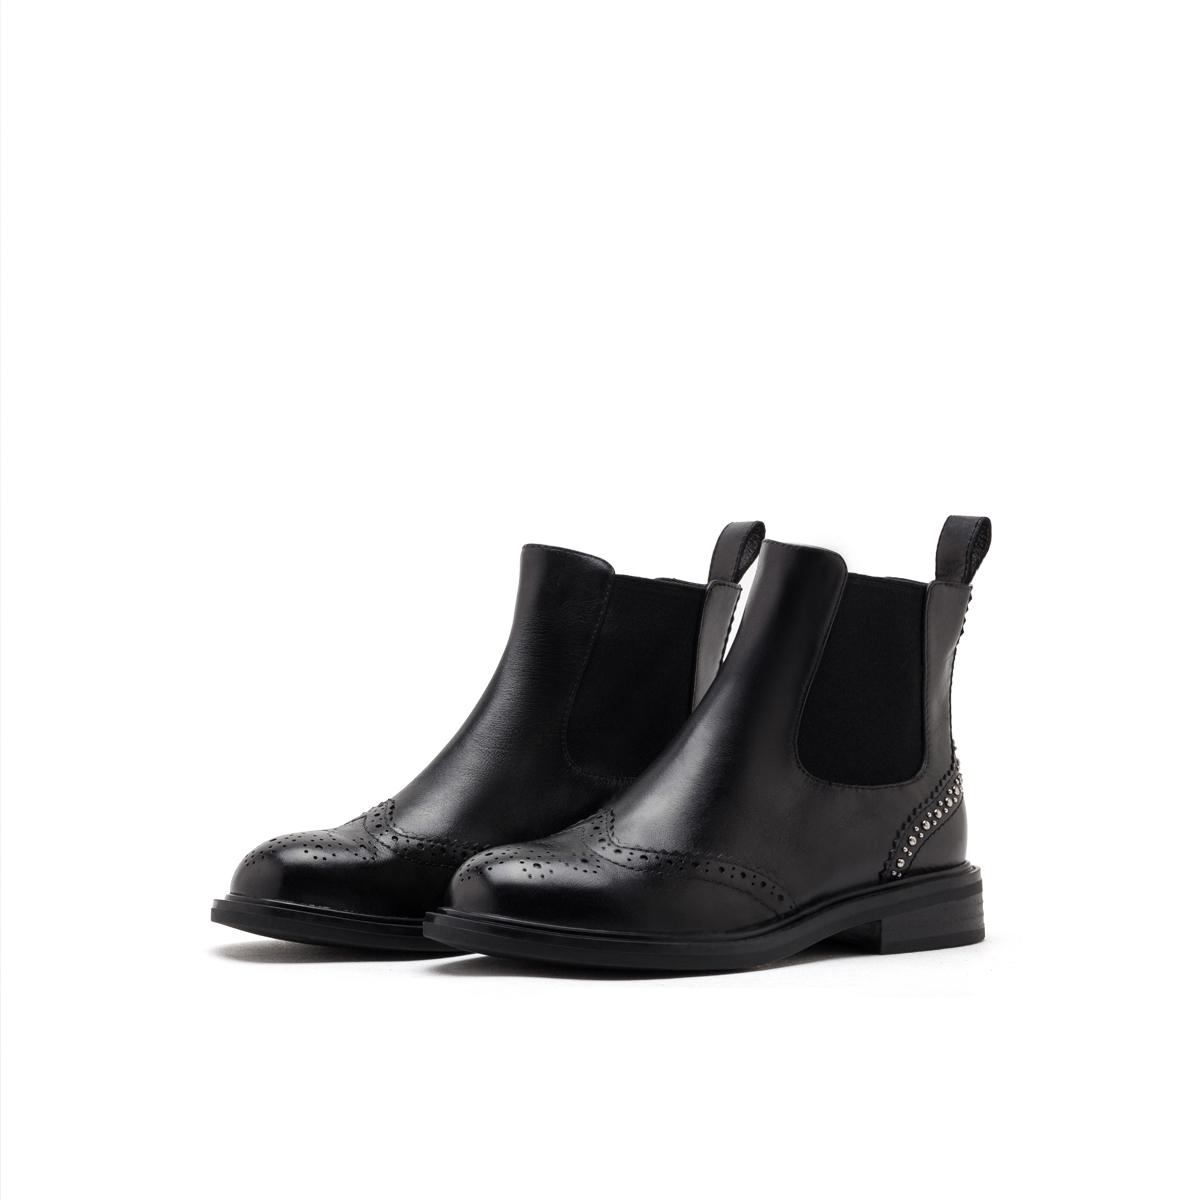 SS94116624 星期六鞋子女潮鞋低跟粗跟铆钉切尔西靴女鞋 Sat & St